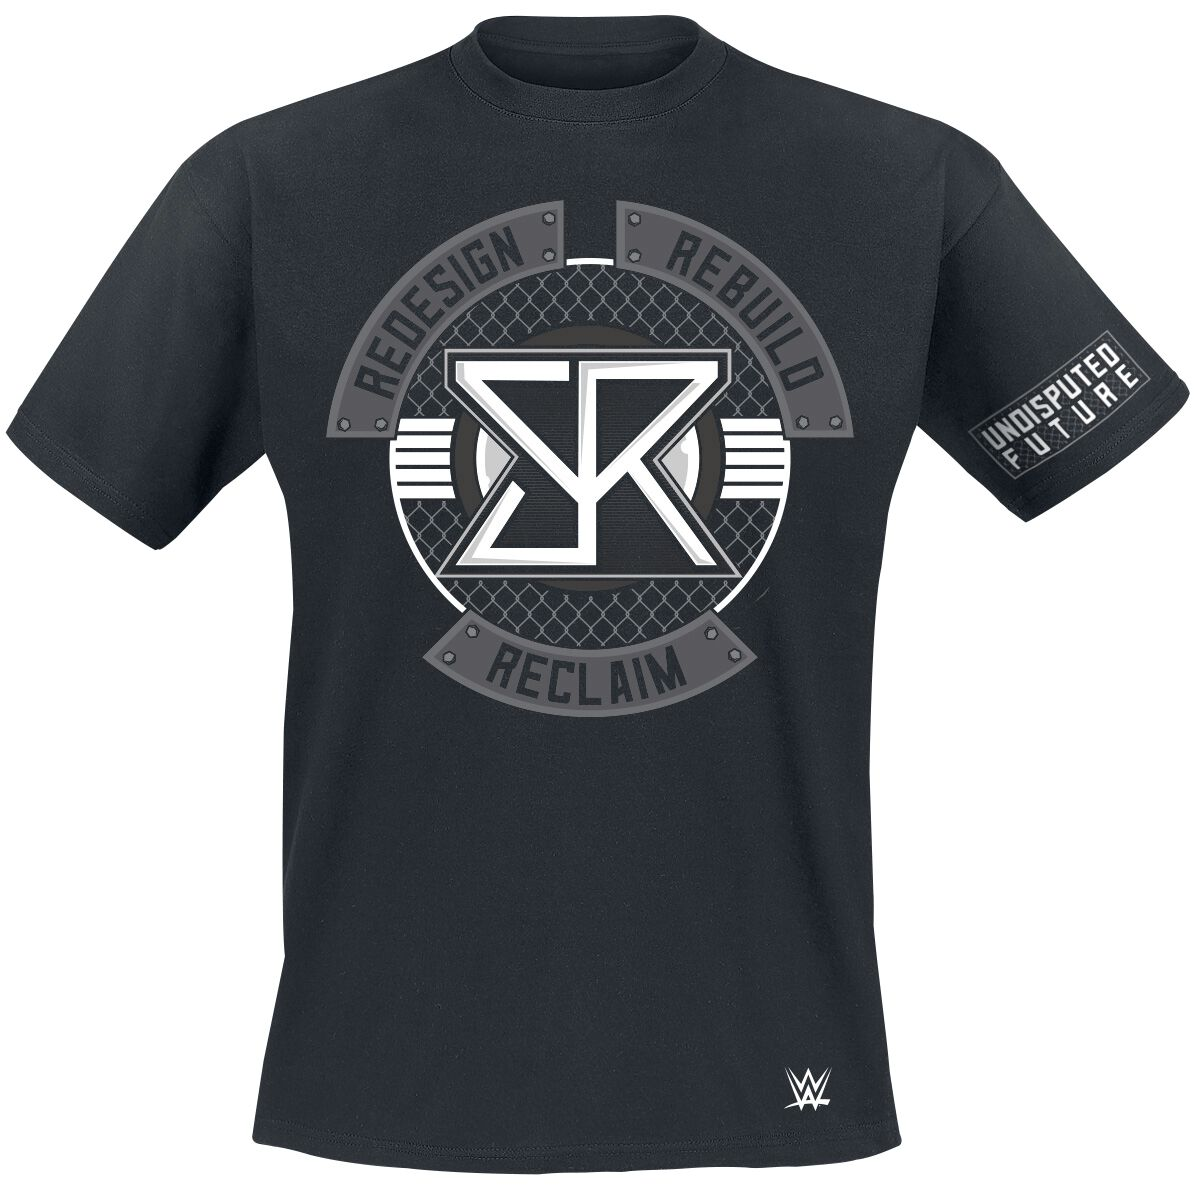 Merch dla Fanów - Koszulki - T-Shirt WWE Seth Rollins T-Shirt czarny - 344947